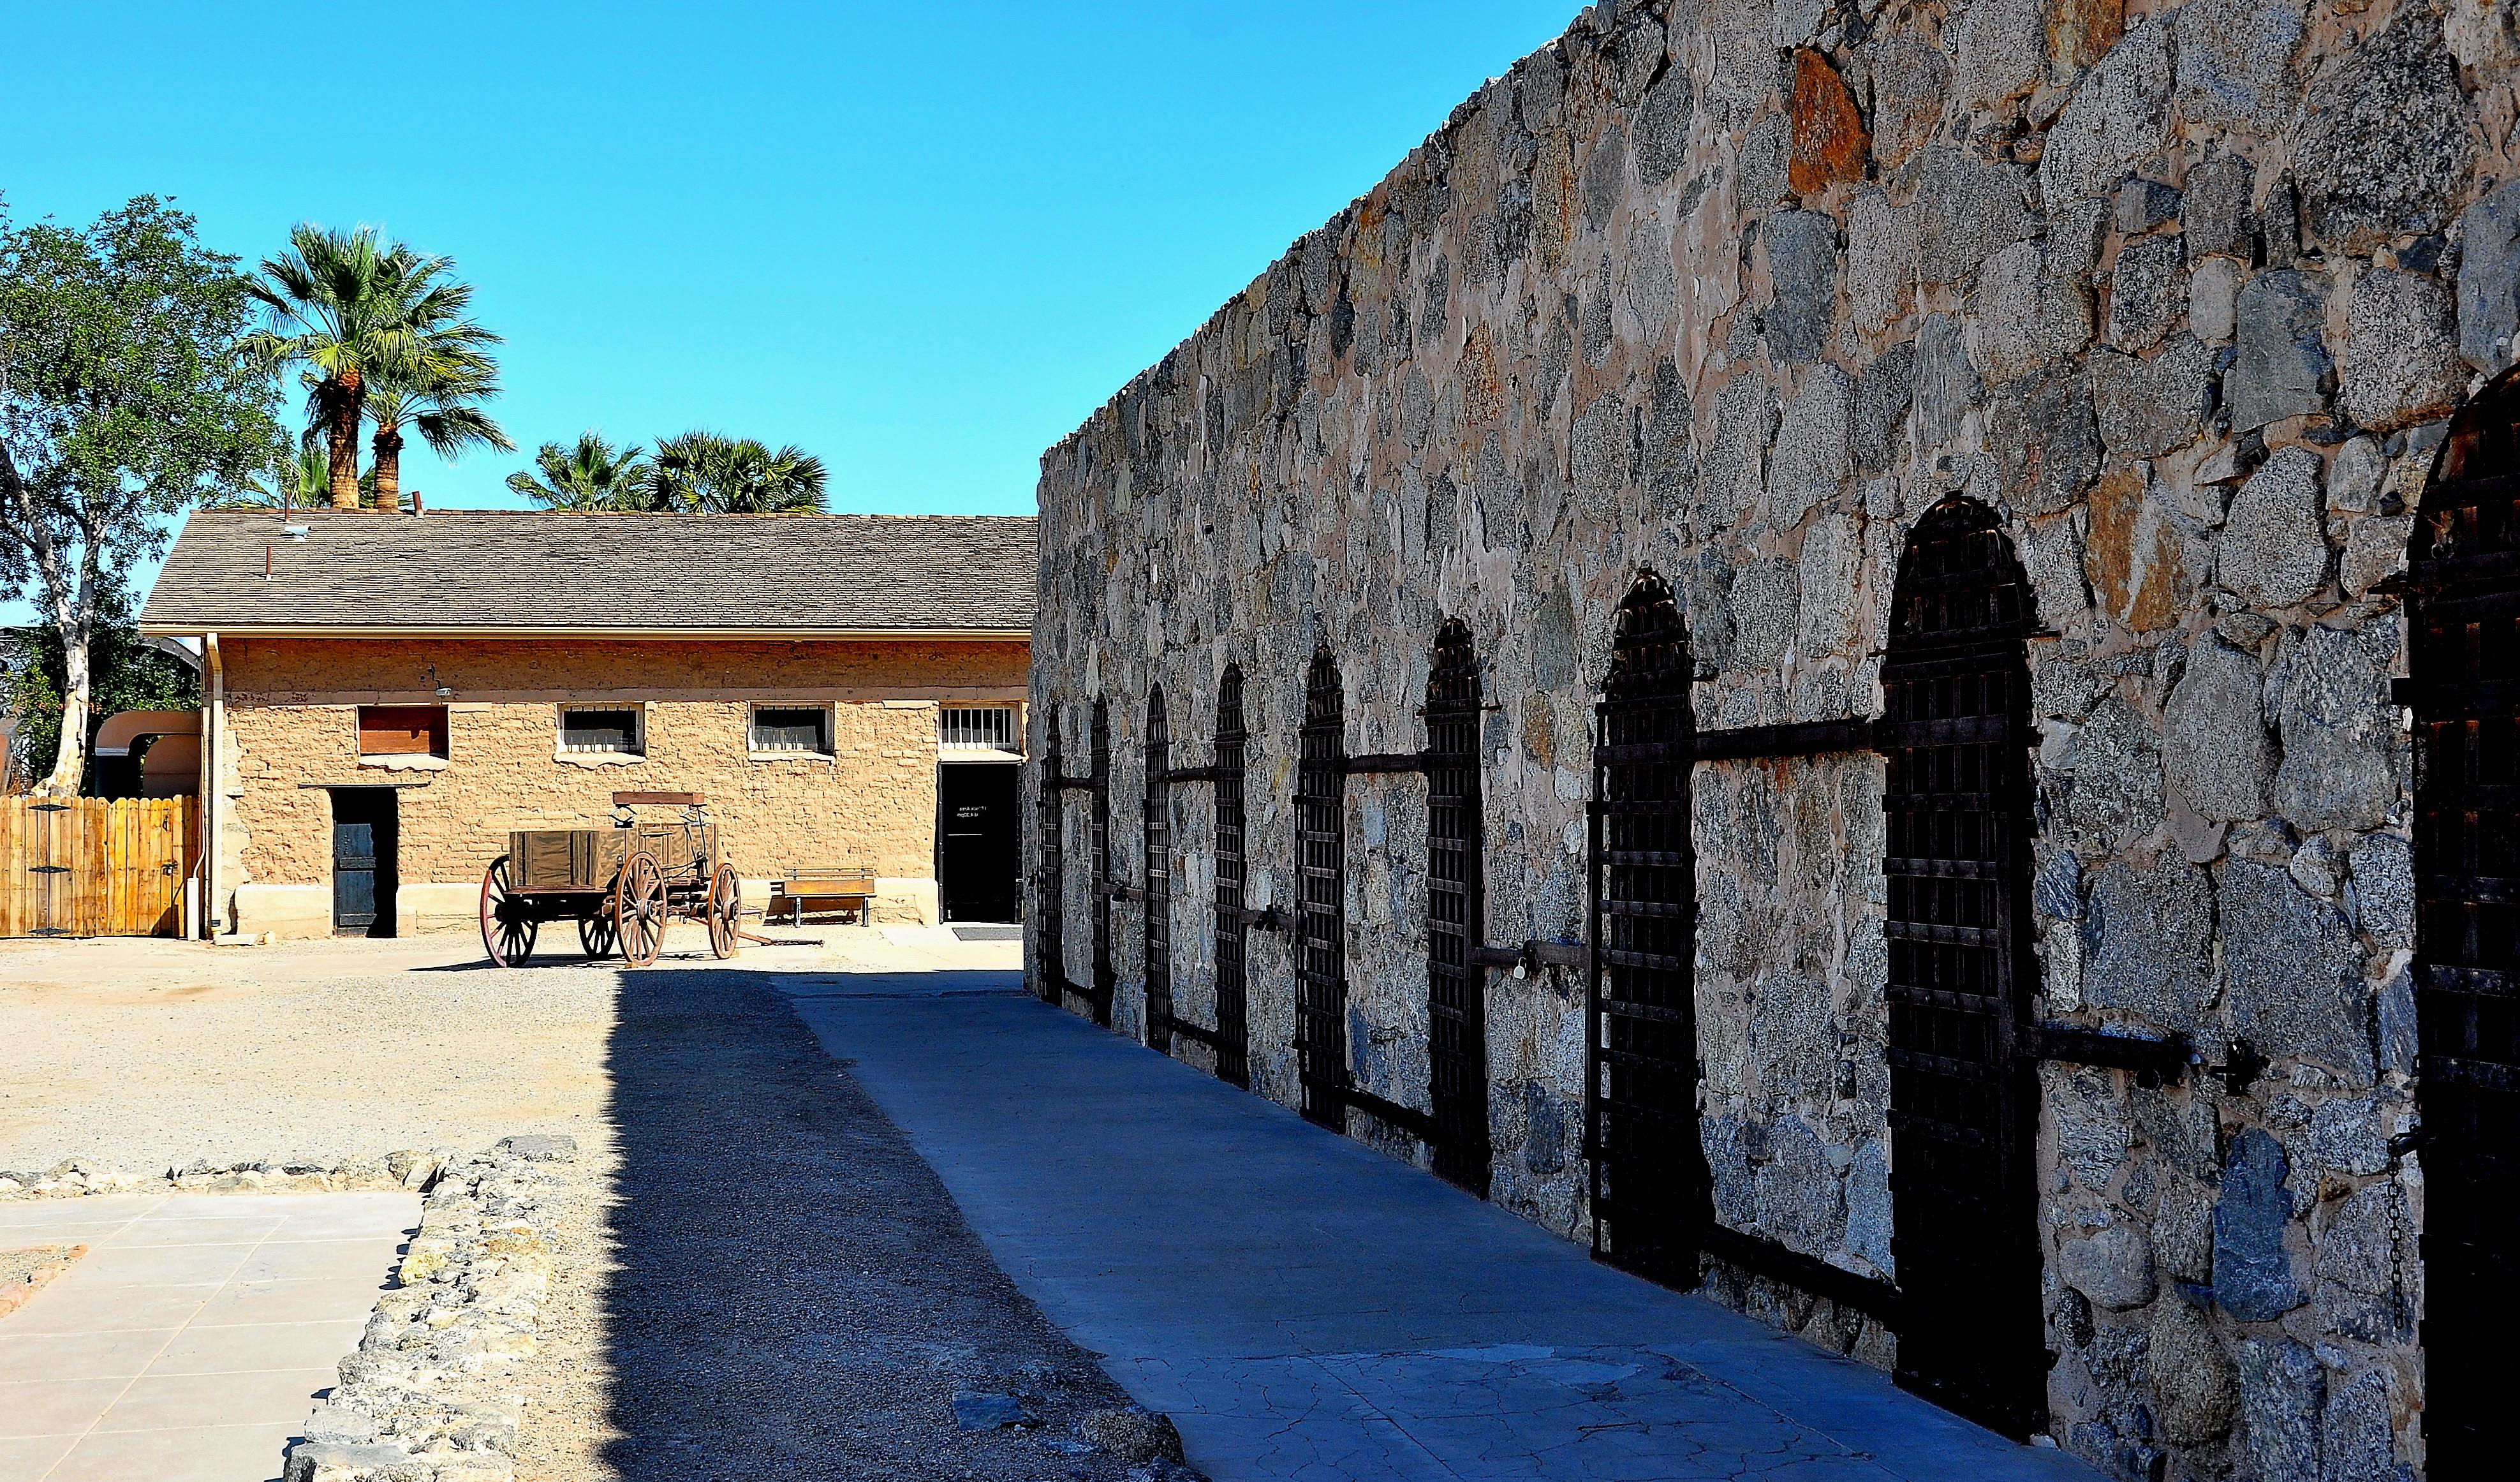 yuma territorial prison haunted